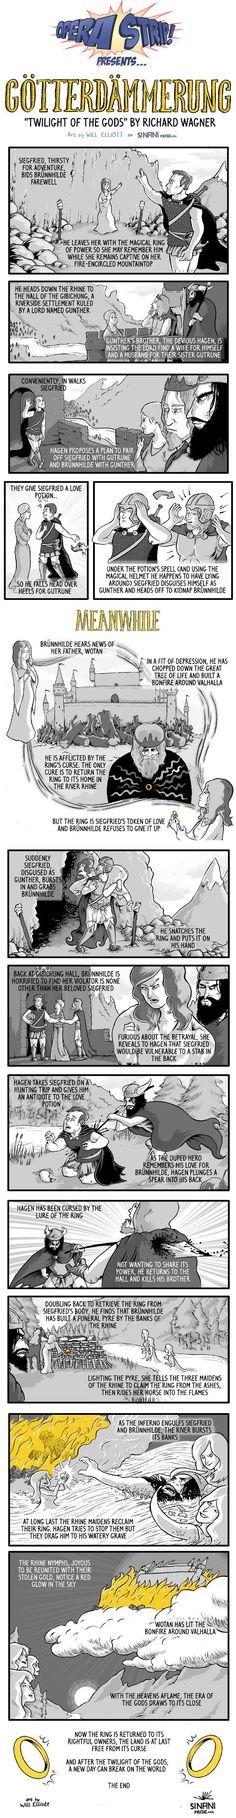 Ring Cycle 4: Götterdämmerung (Twilight of the Gods) An Opera by Richard Wagner. Opera Comic Strip Art by William Elliott